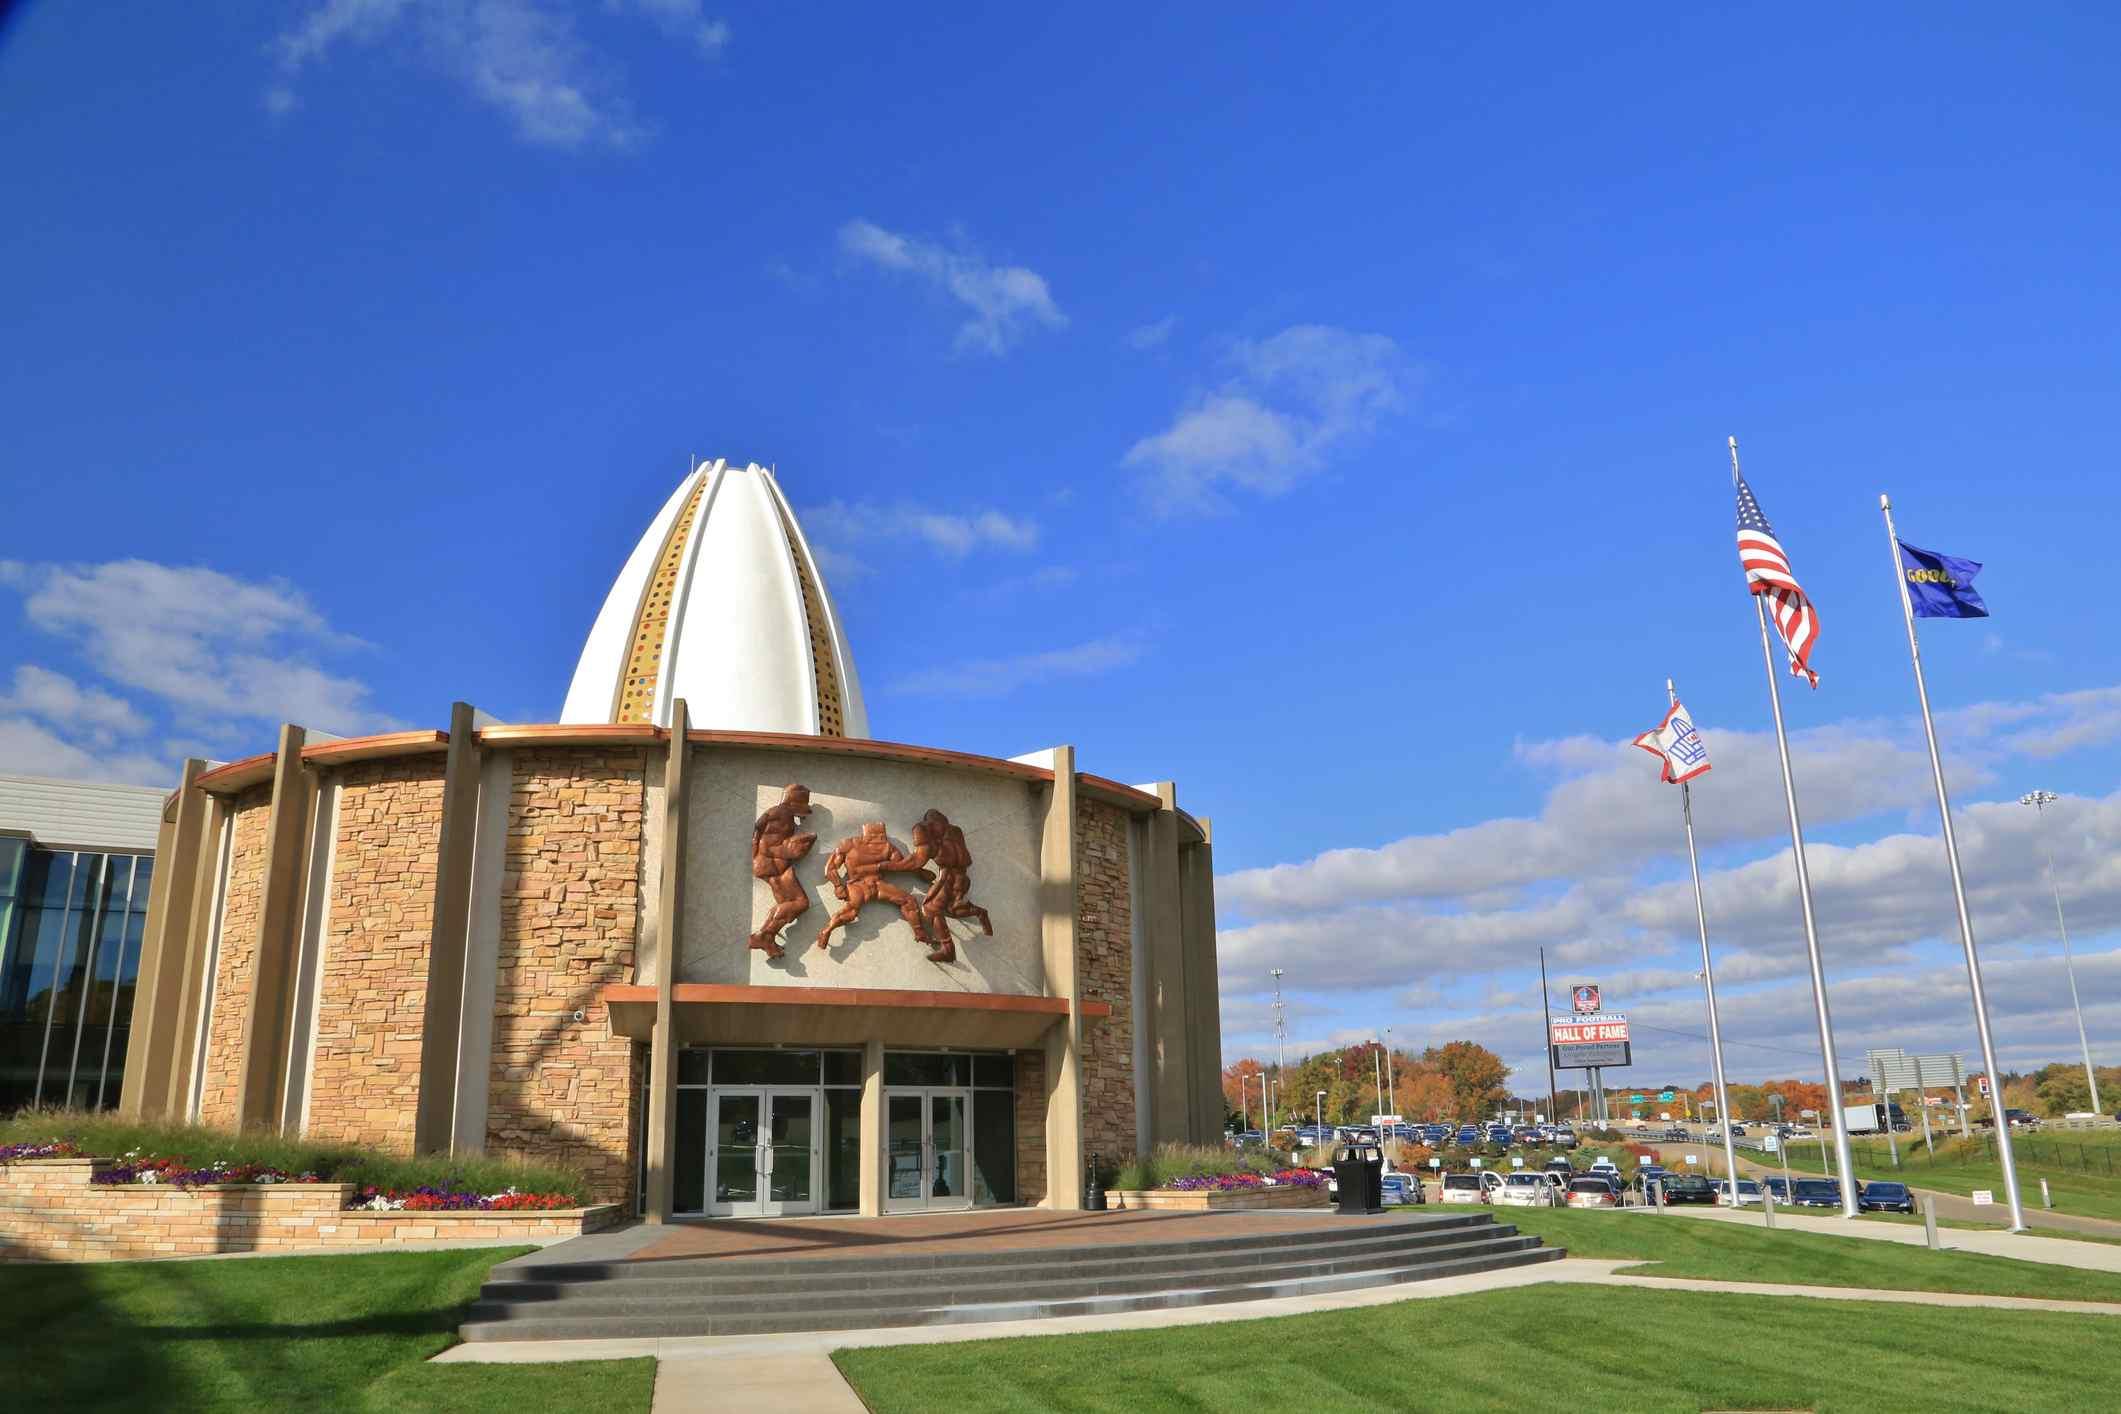 National Football Leage Pro Football Hall Of Fame, NFL , Canton, Ohio, USA